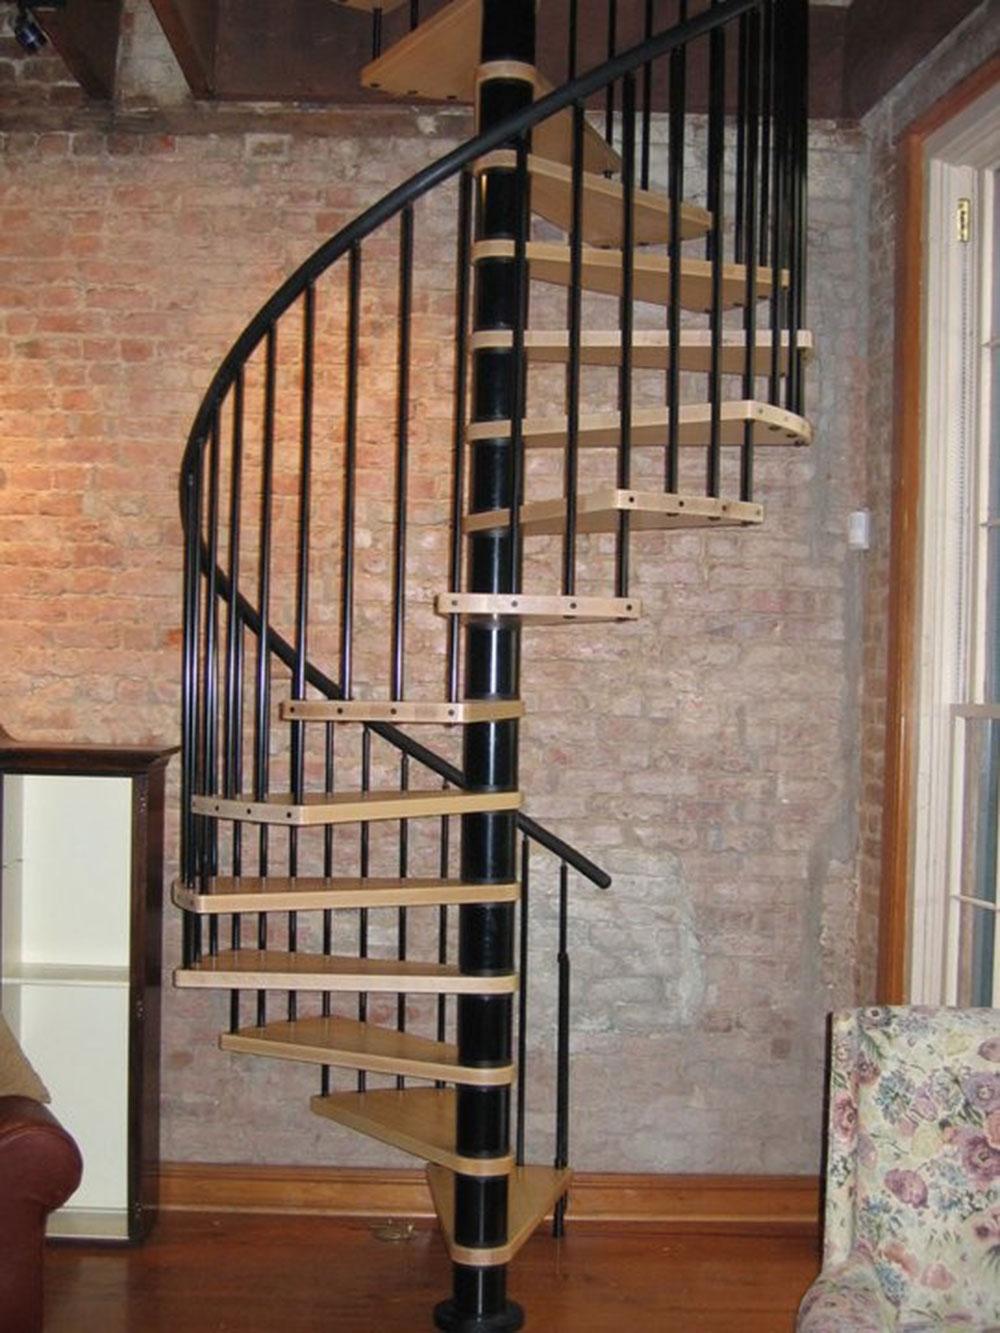 Spiral-Staircases-by-The-Stairway-Shop Les différents types d'escaliers à connaître